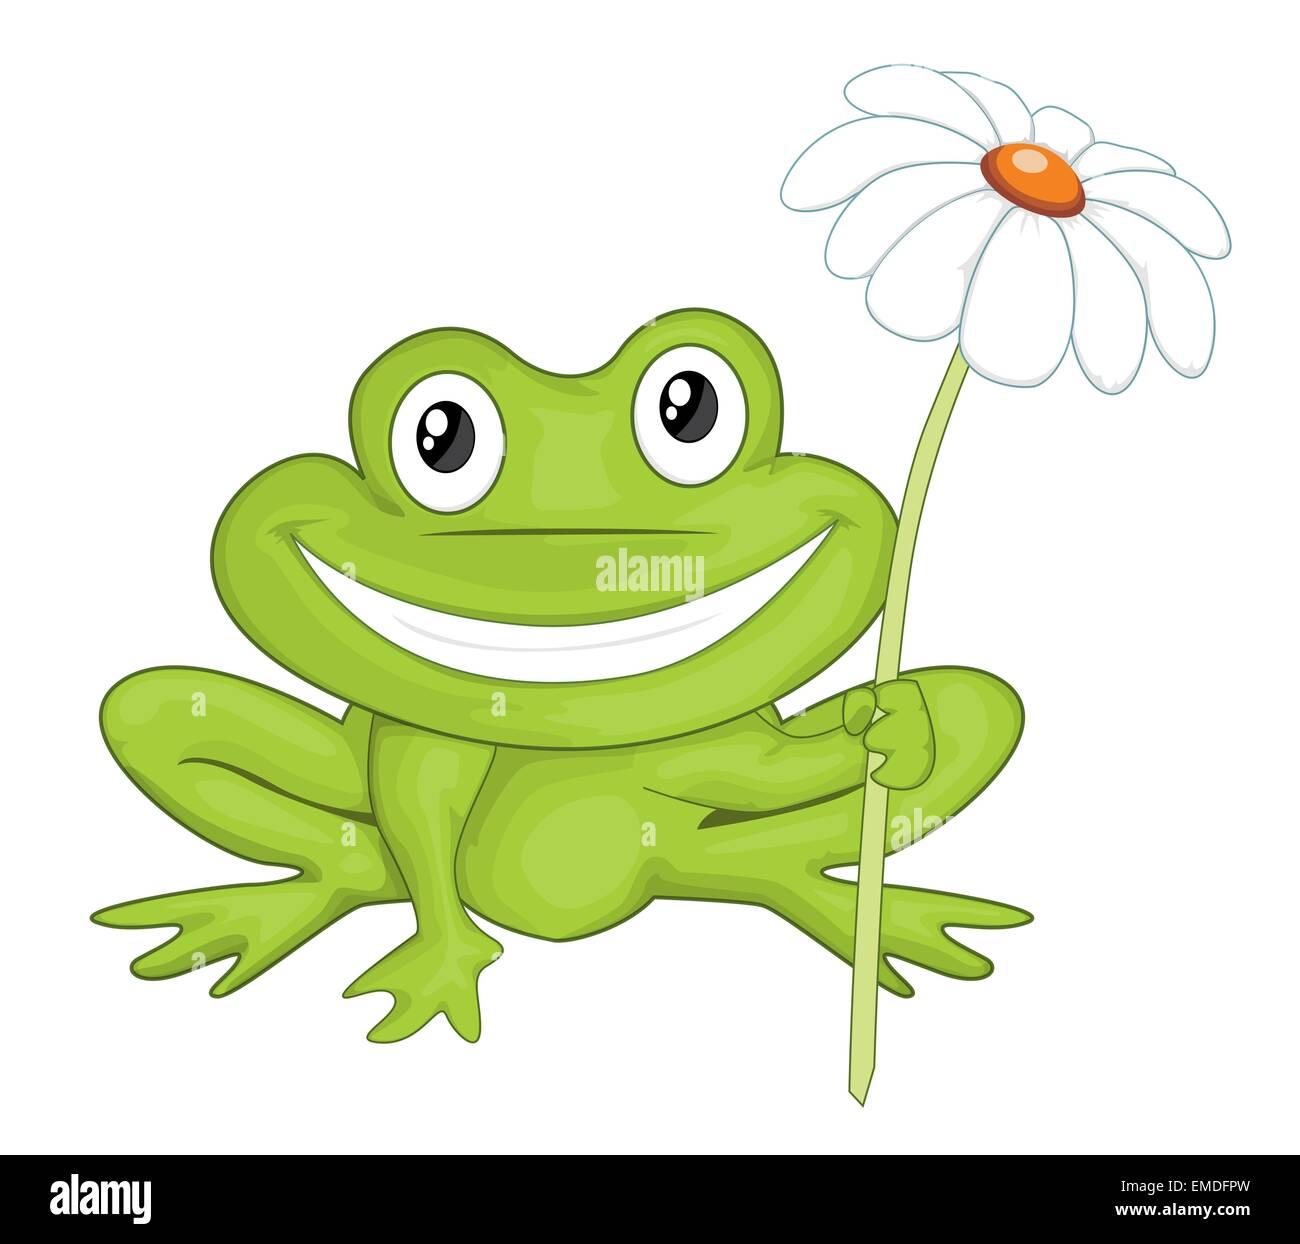 cartoon frog stock vector art illustration vector image 81432369 rh alamy com Leaping Frog Clip Art Vector The Crocodile